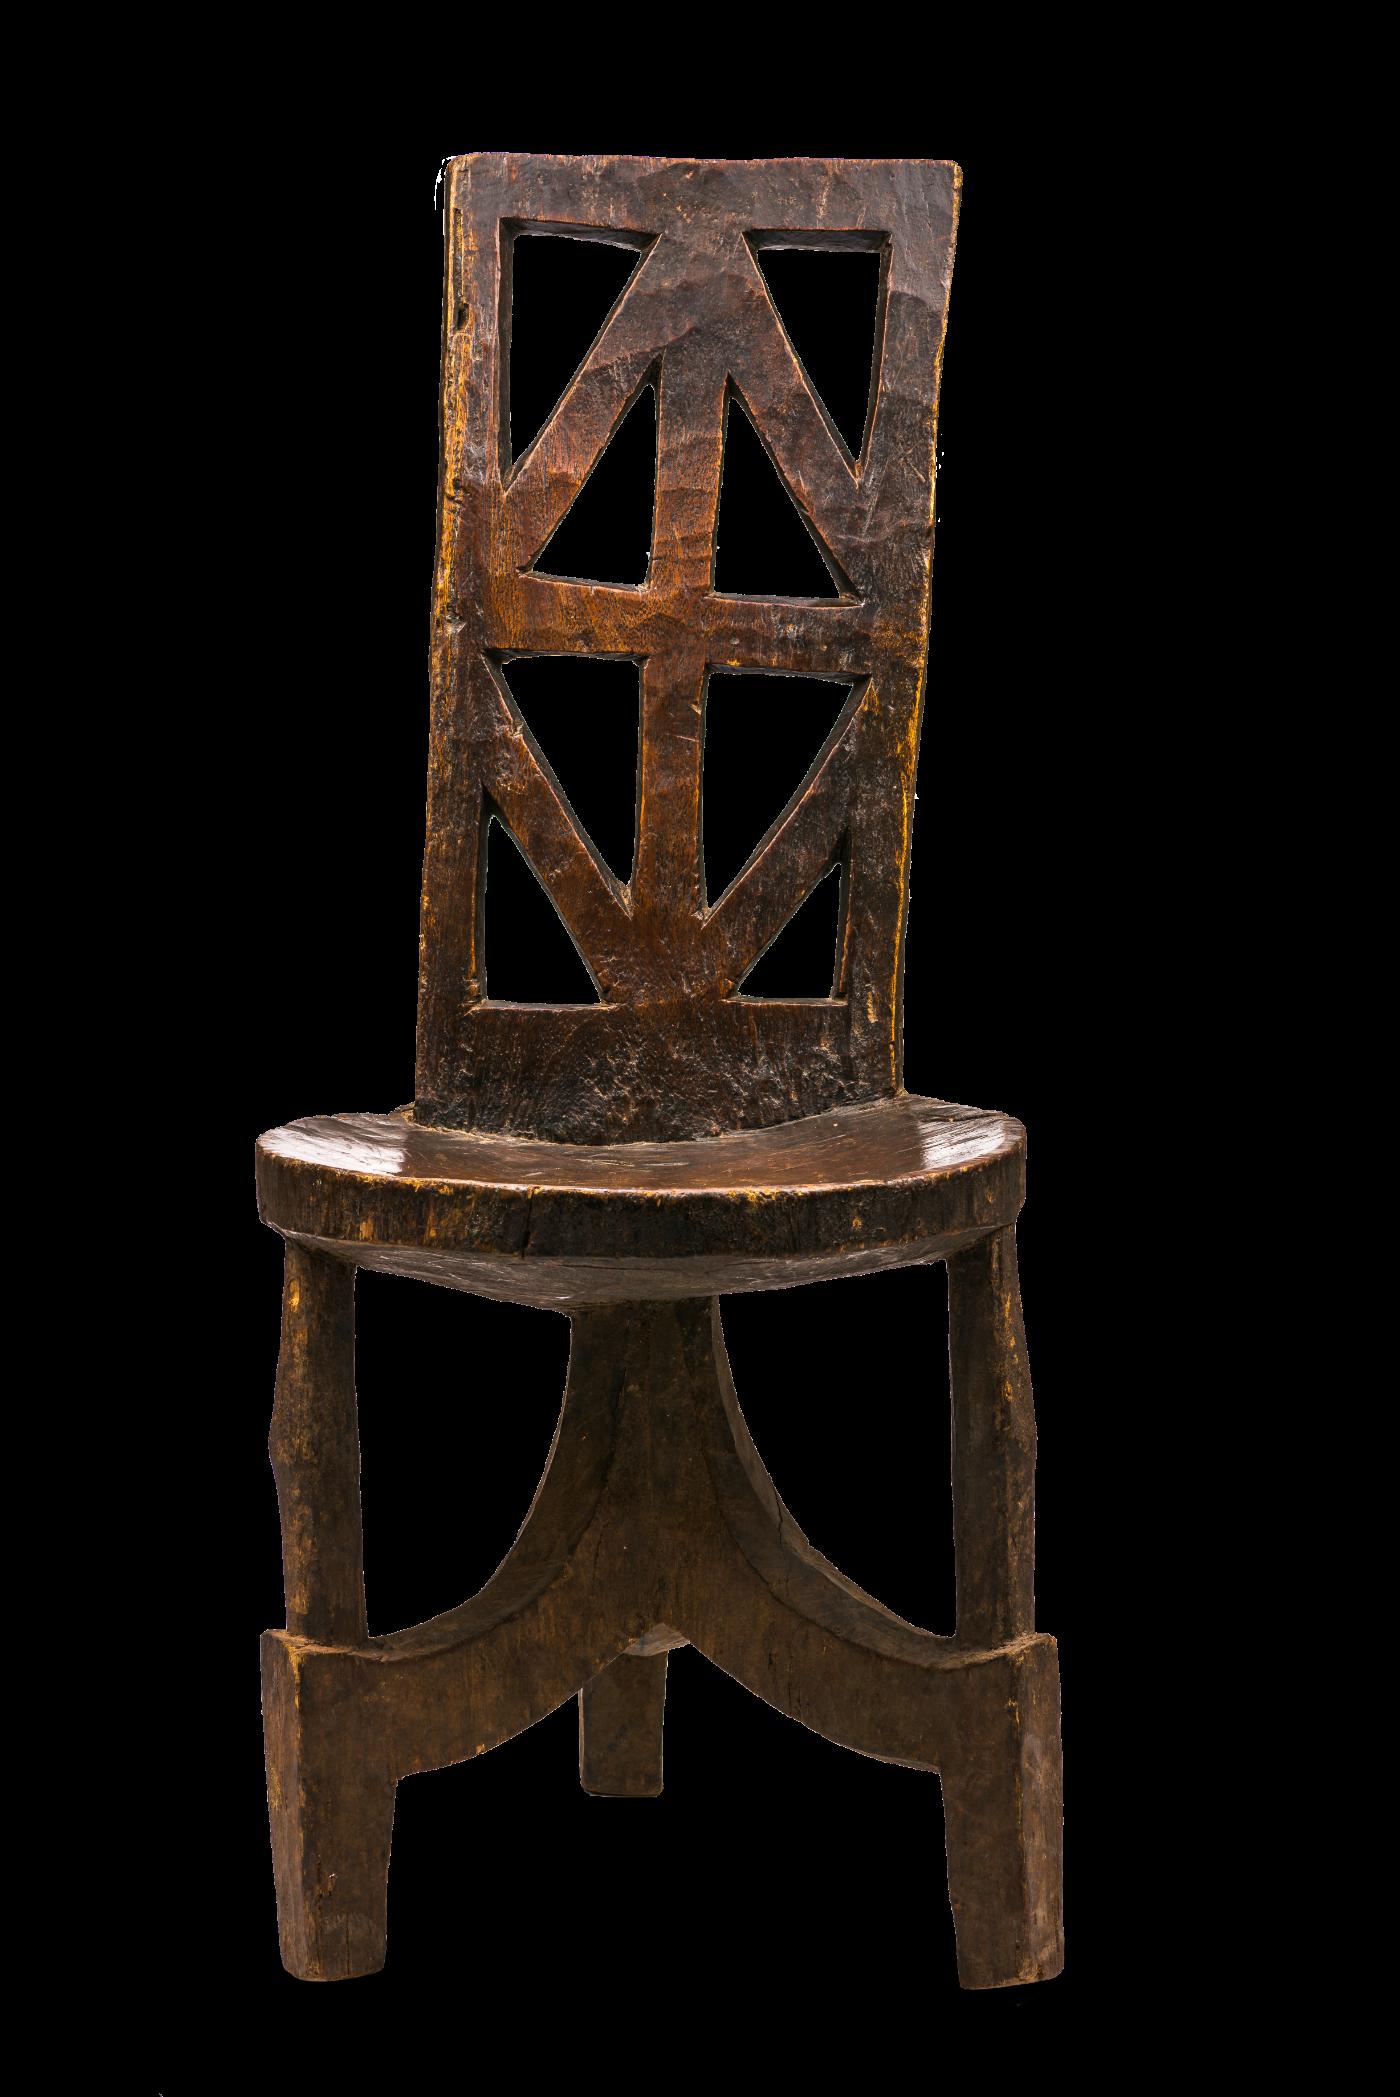 Walega Chair, Ethiopia